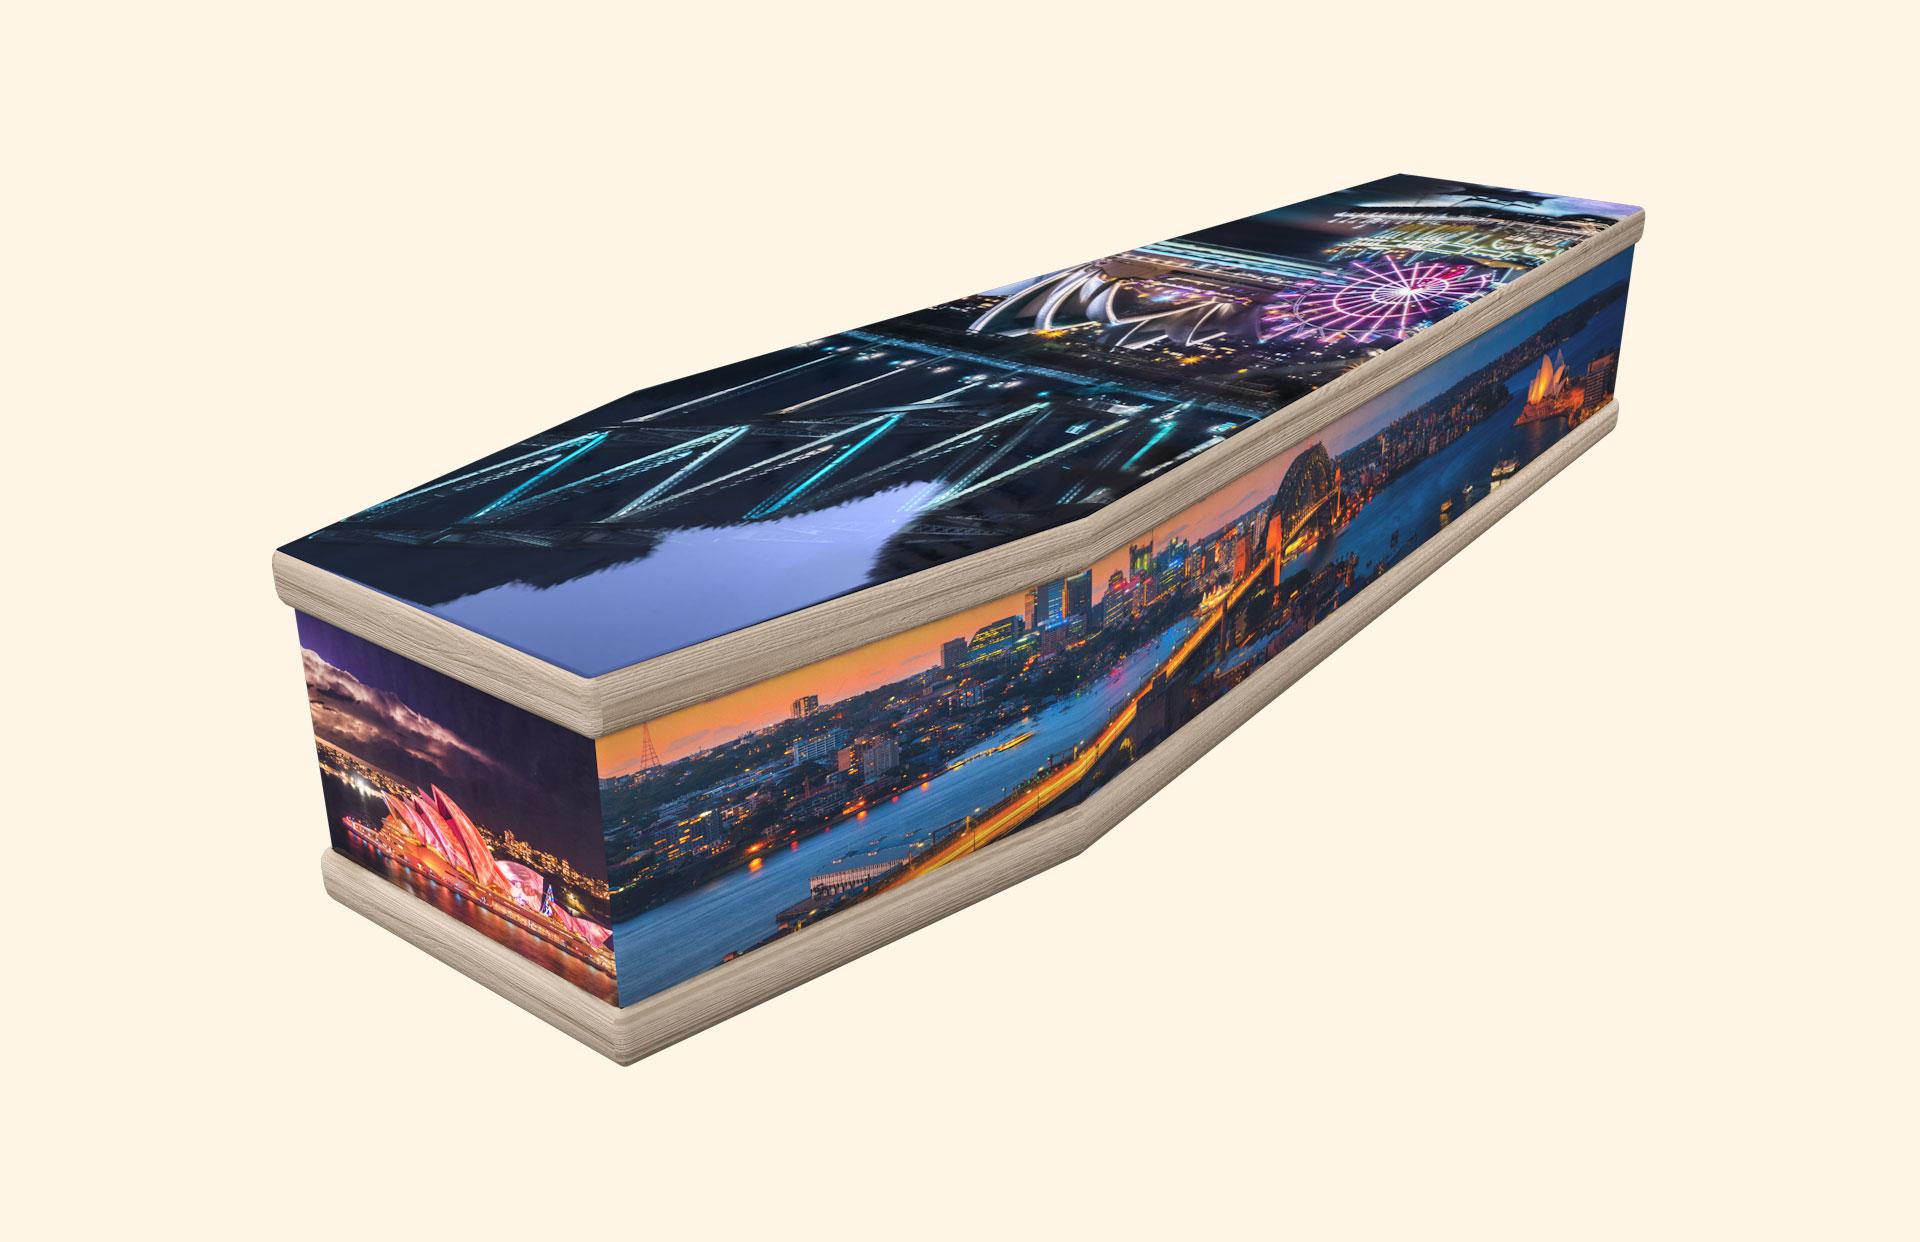 Sydney classic coffin